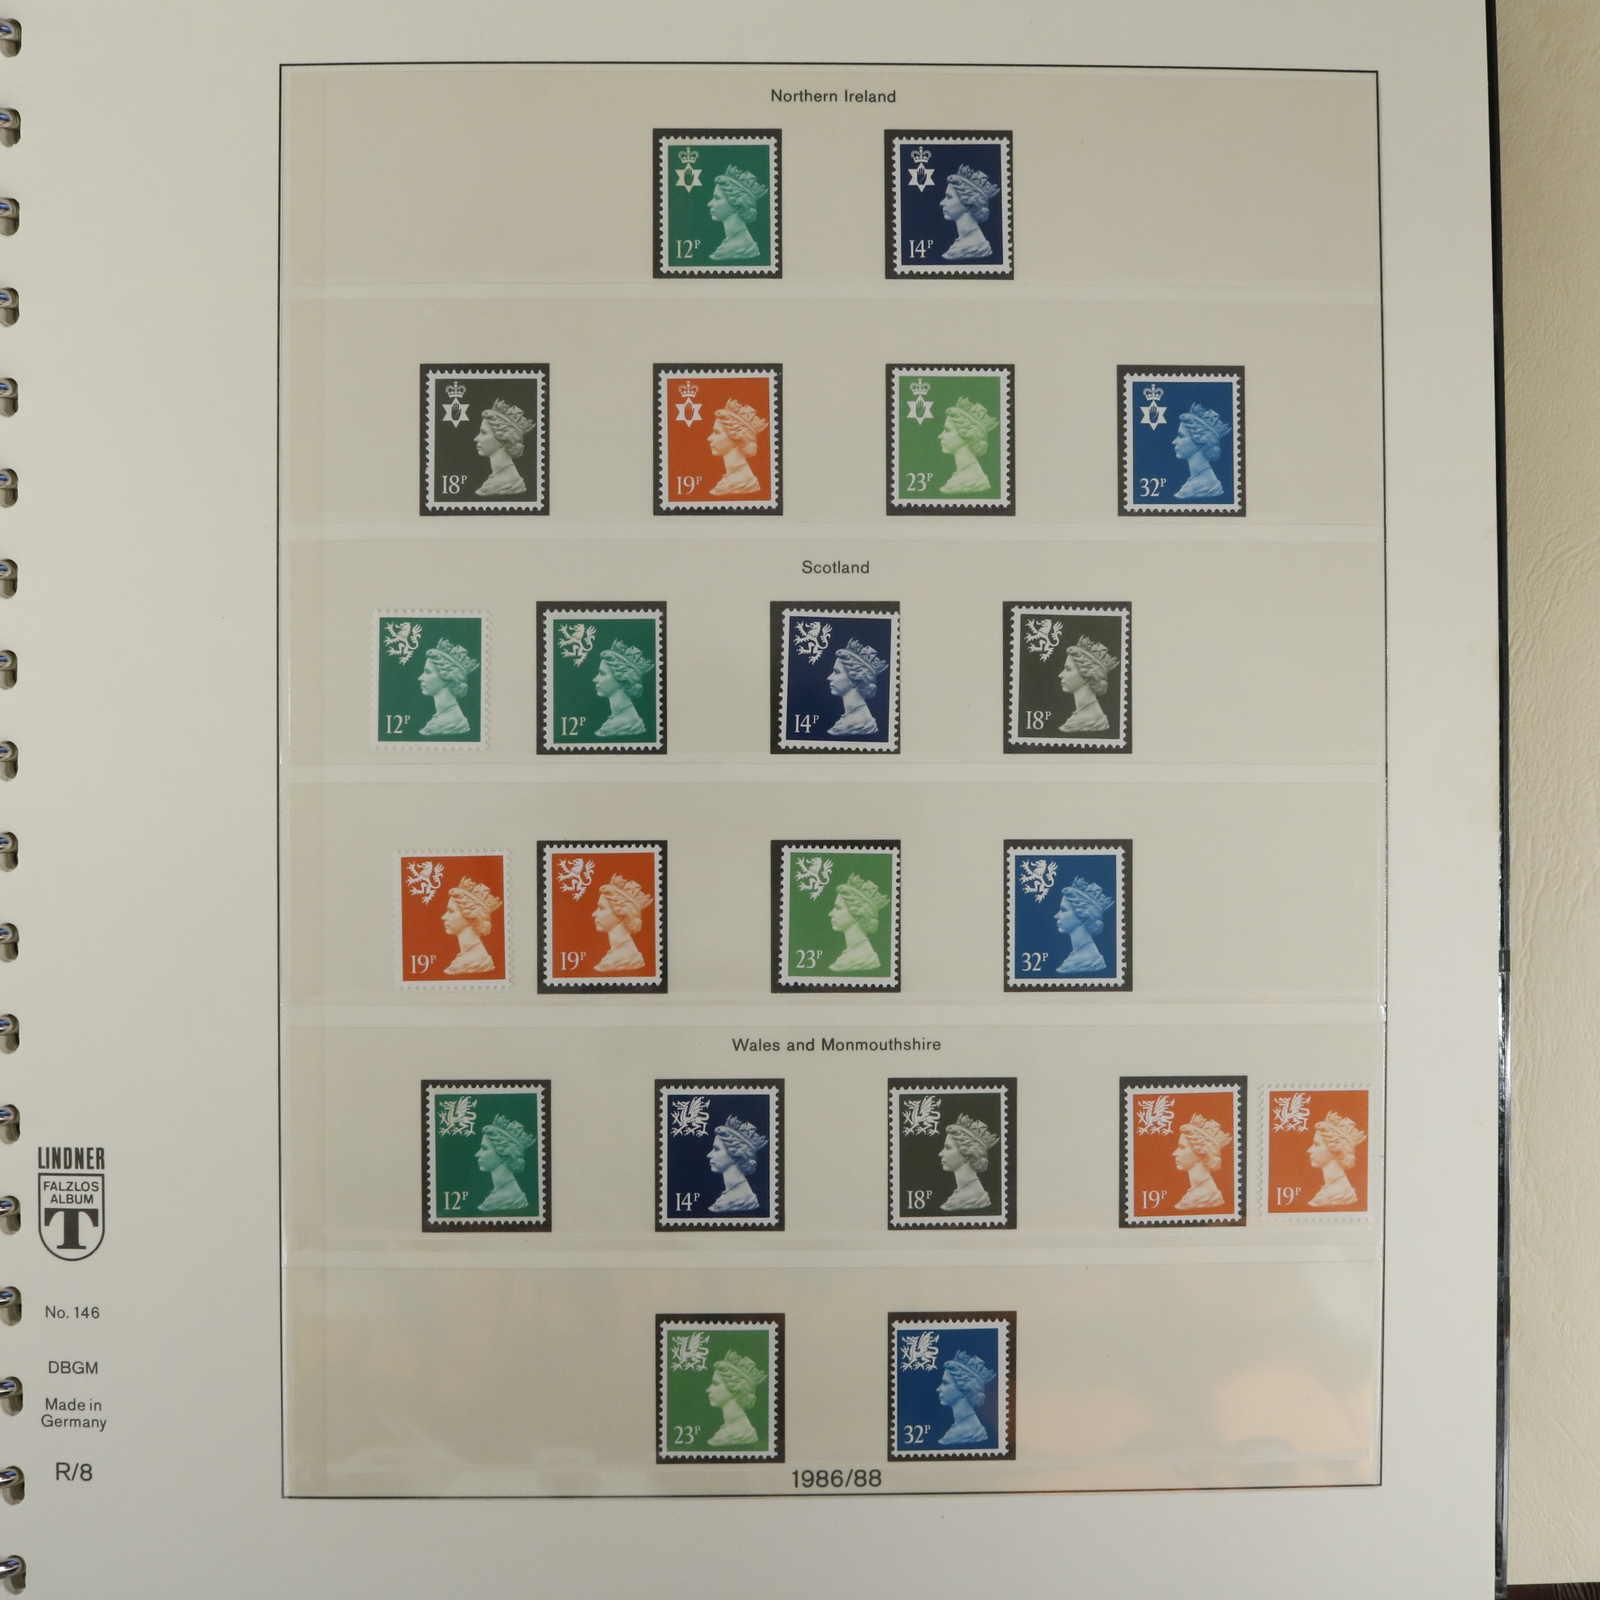 Lot 746 - Collections Louis Nicollin Great Britain -  Auktionshaus Schlegel 26 Public Auction